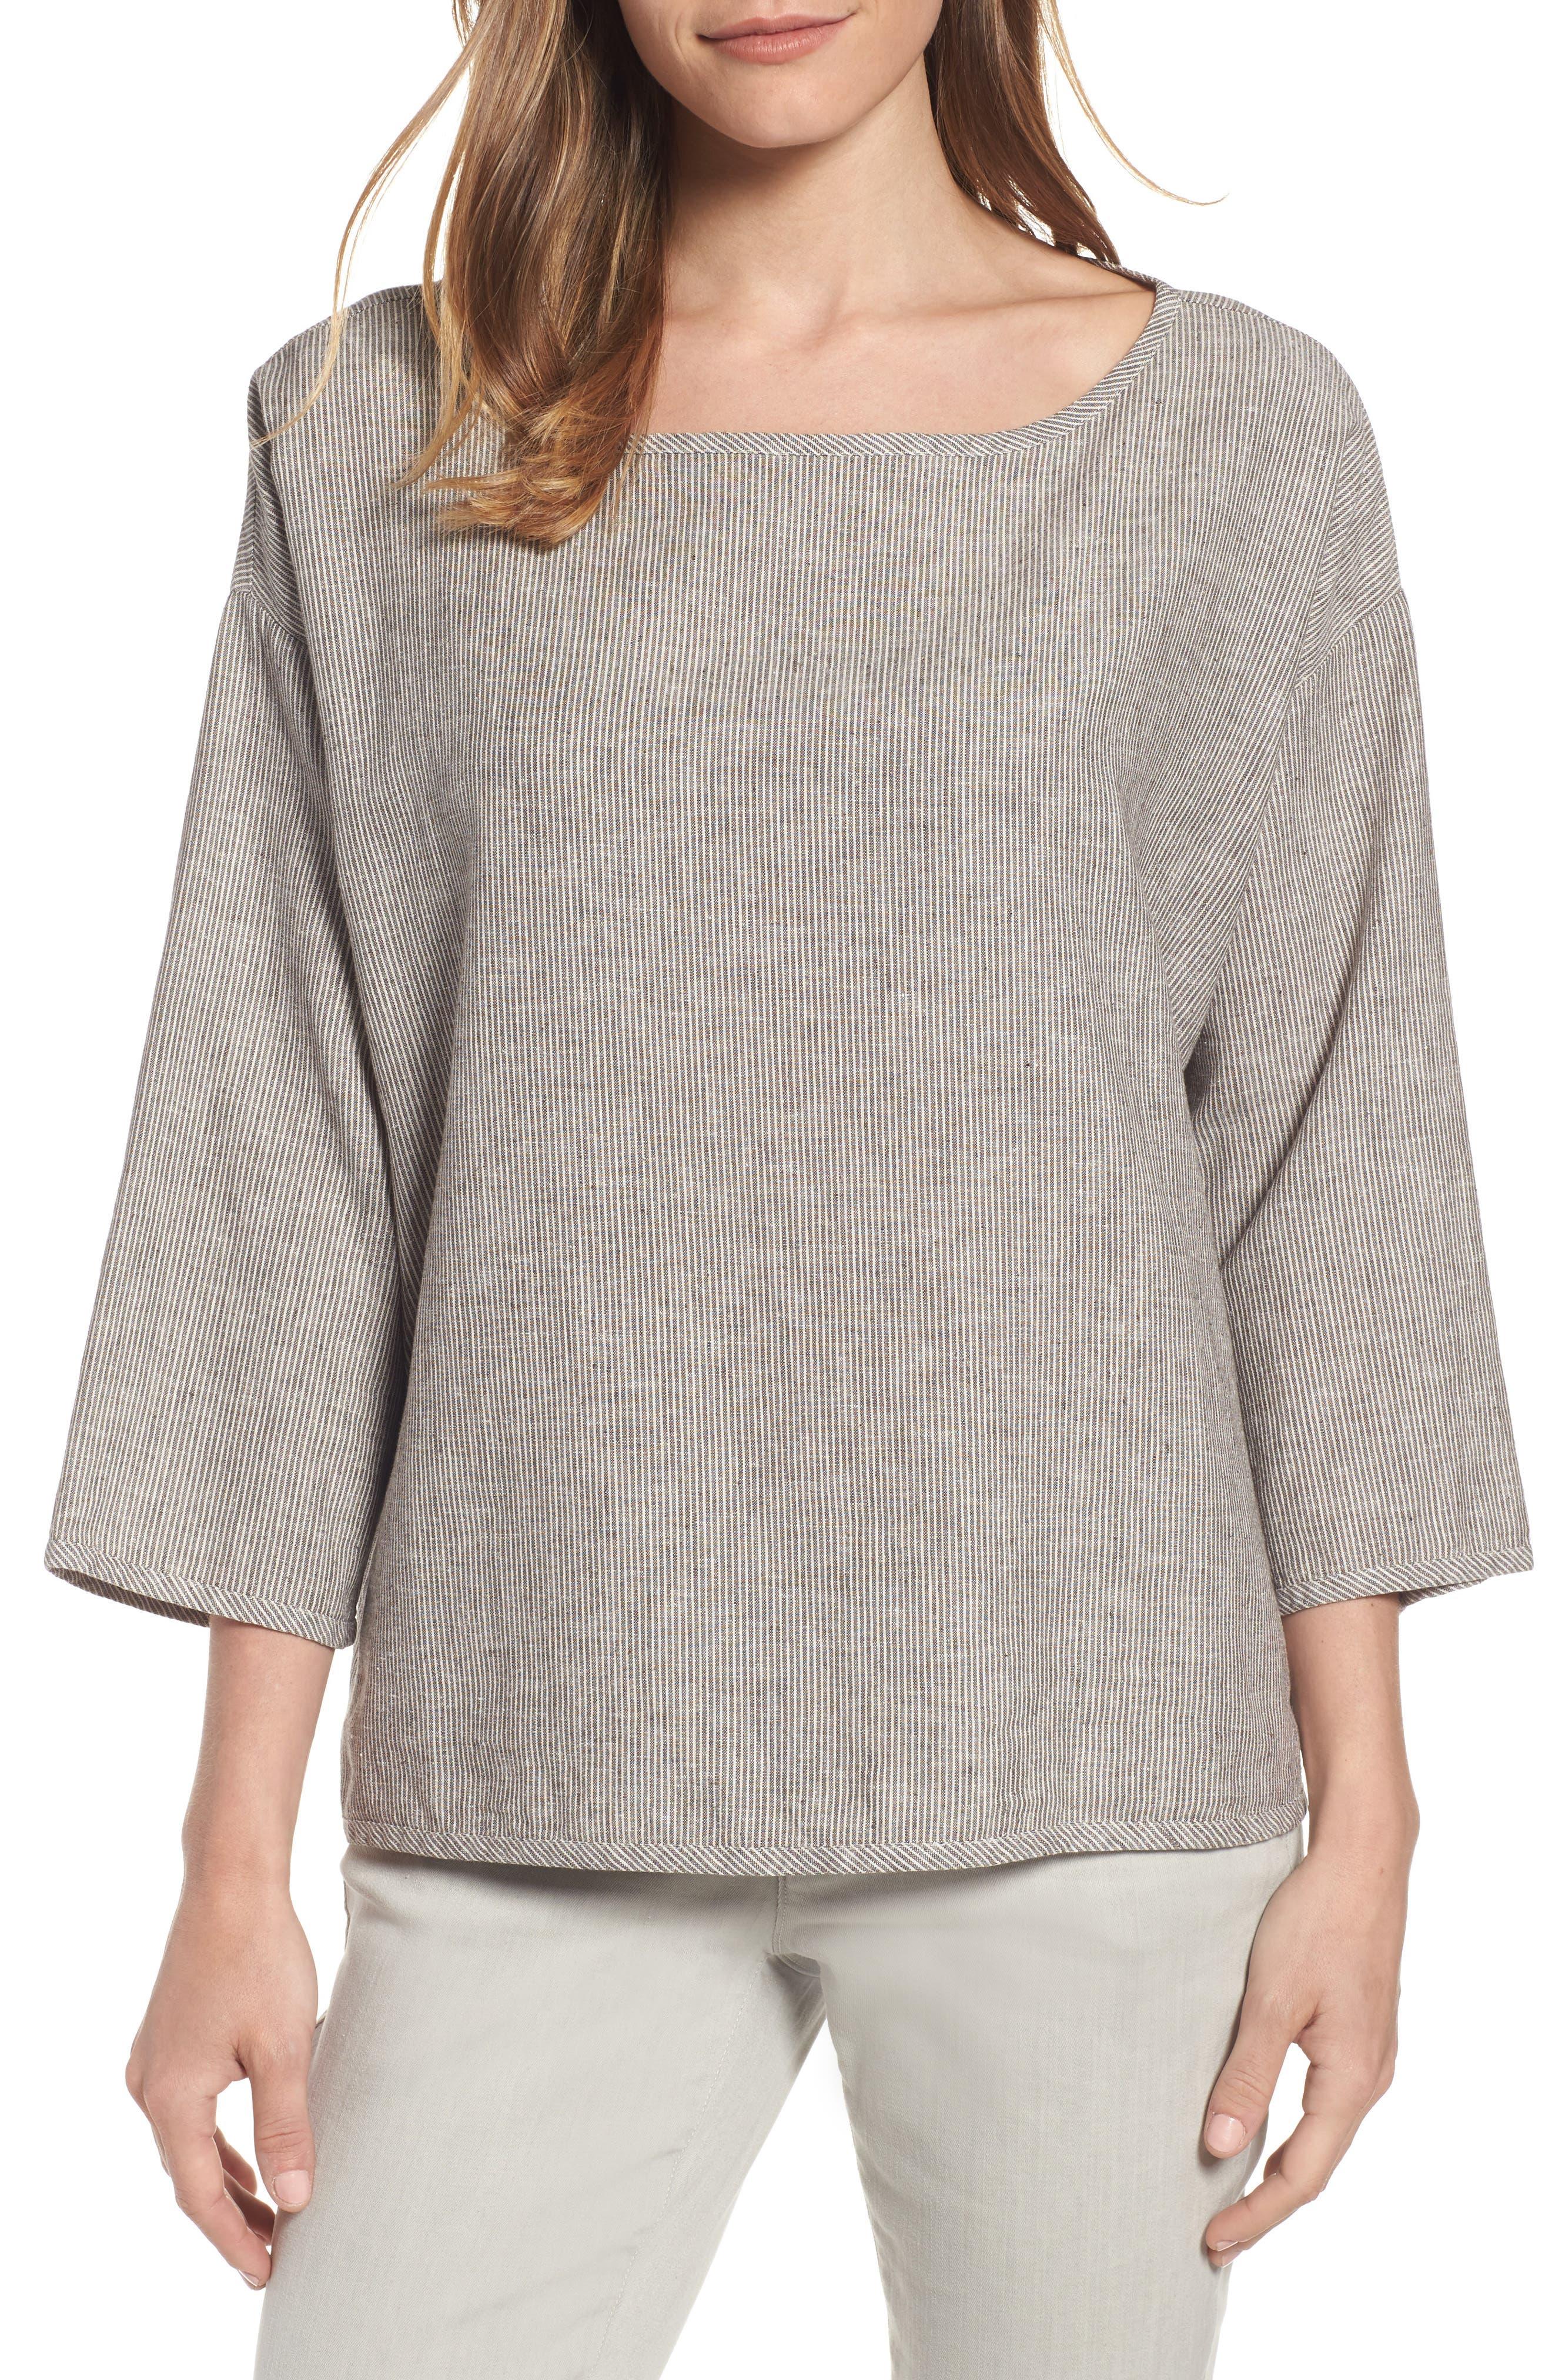 Eileen Fisher Stripe Hemp & Organic Cotton Boxy Top